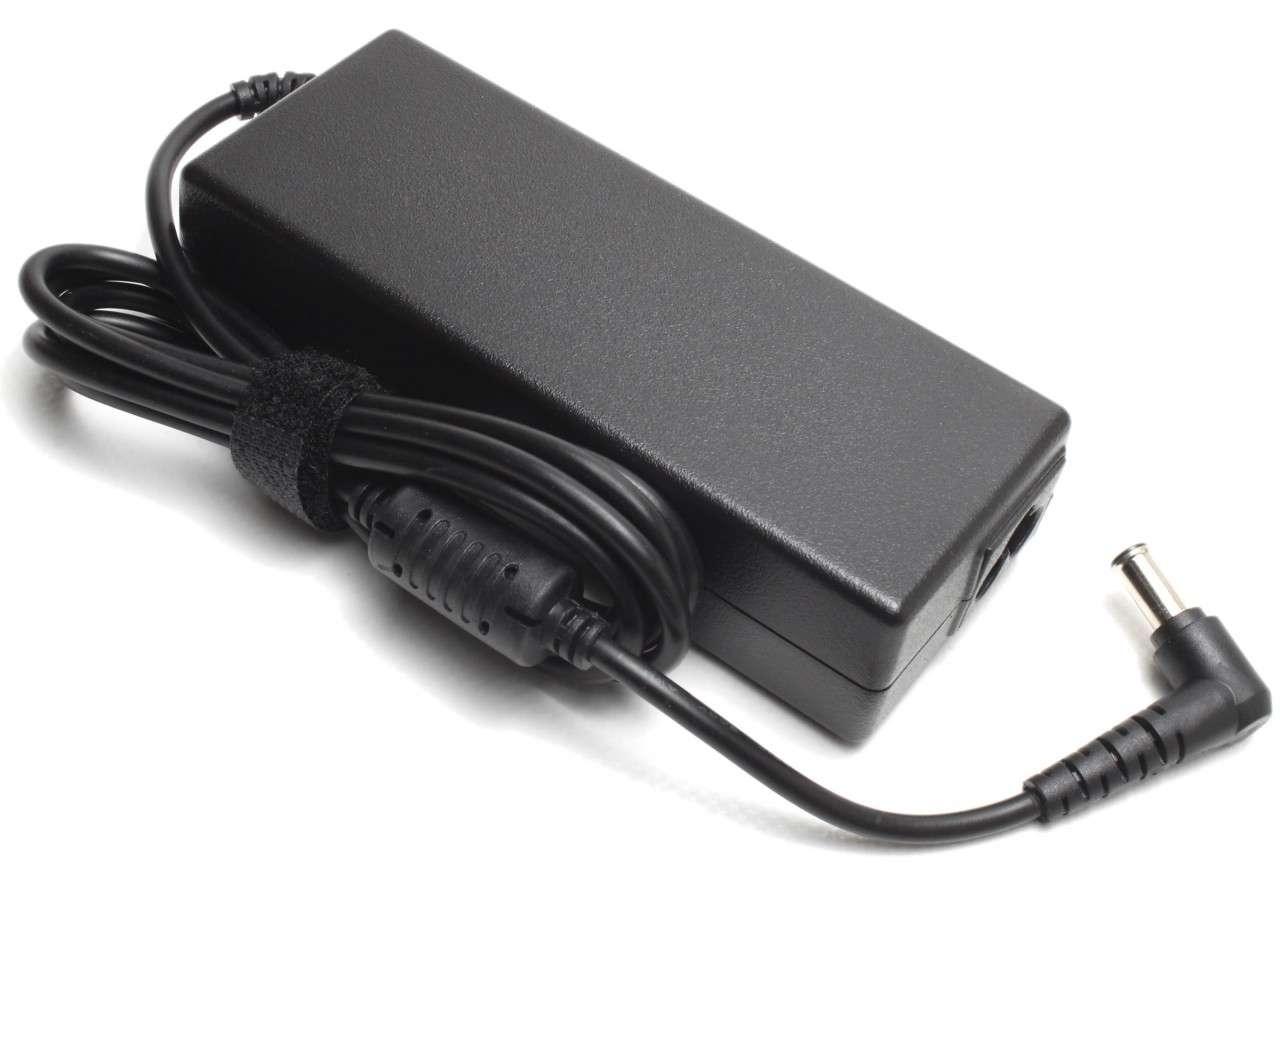 Incarcator Sony Vaio VGN FE41 Replacement imagine powerlaptop.ro 2021